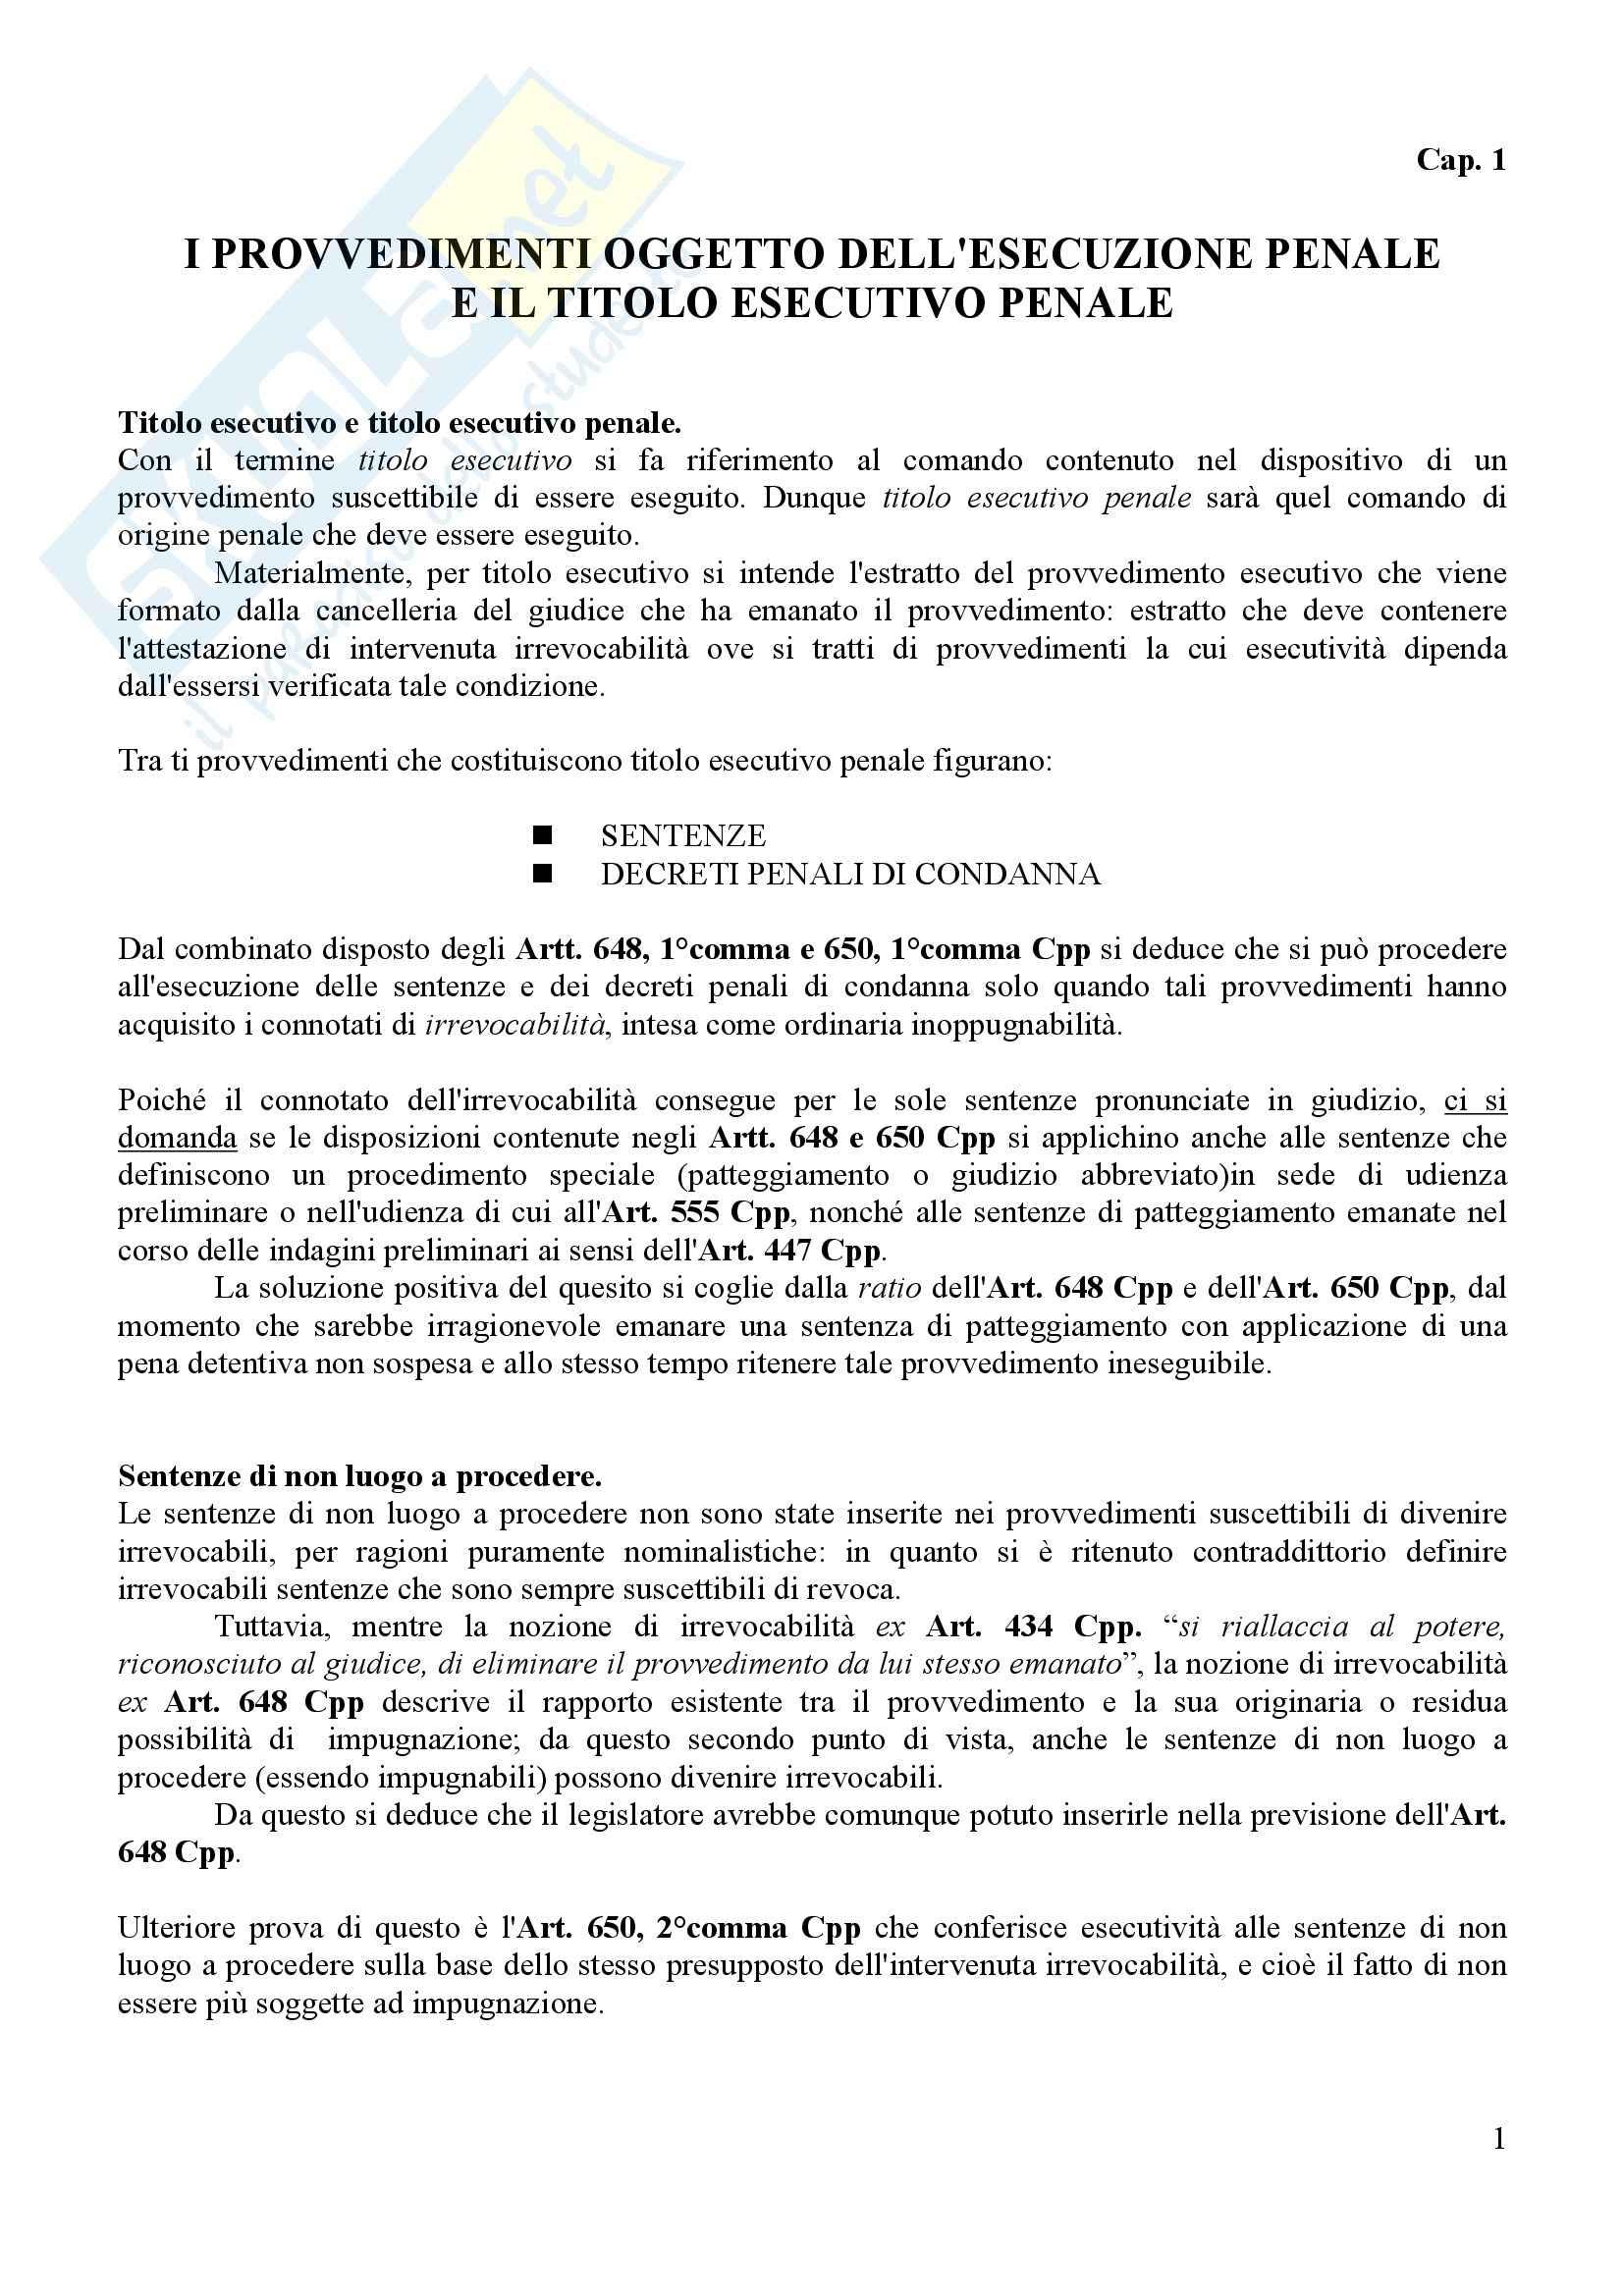 Procedura penale II - esecuzione penale